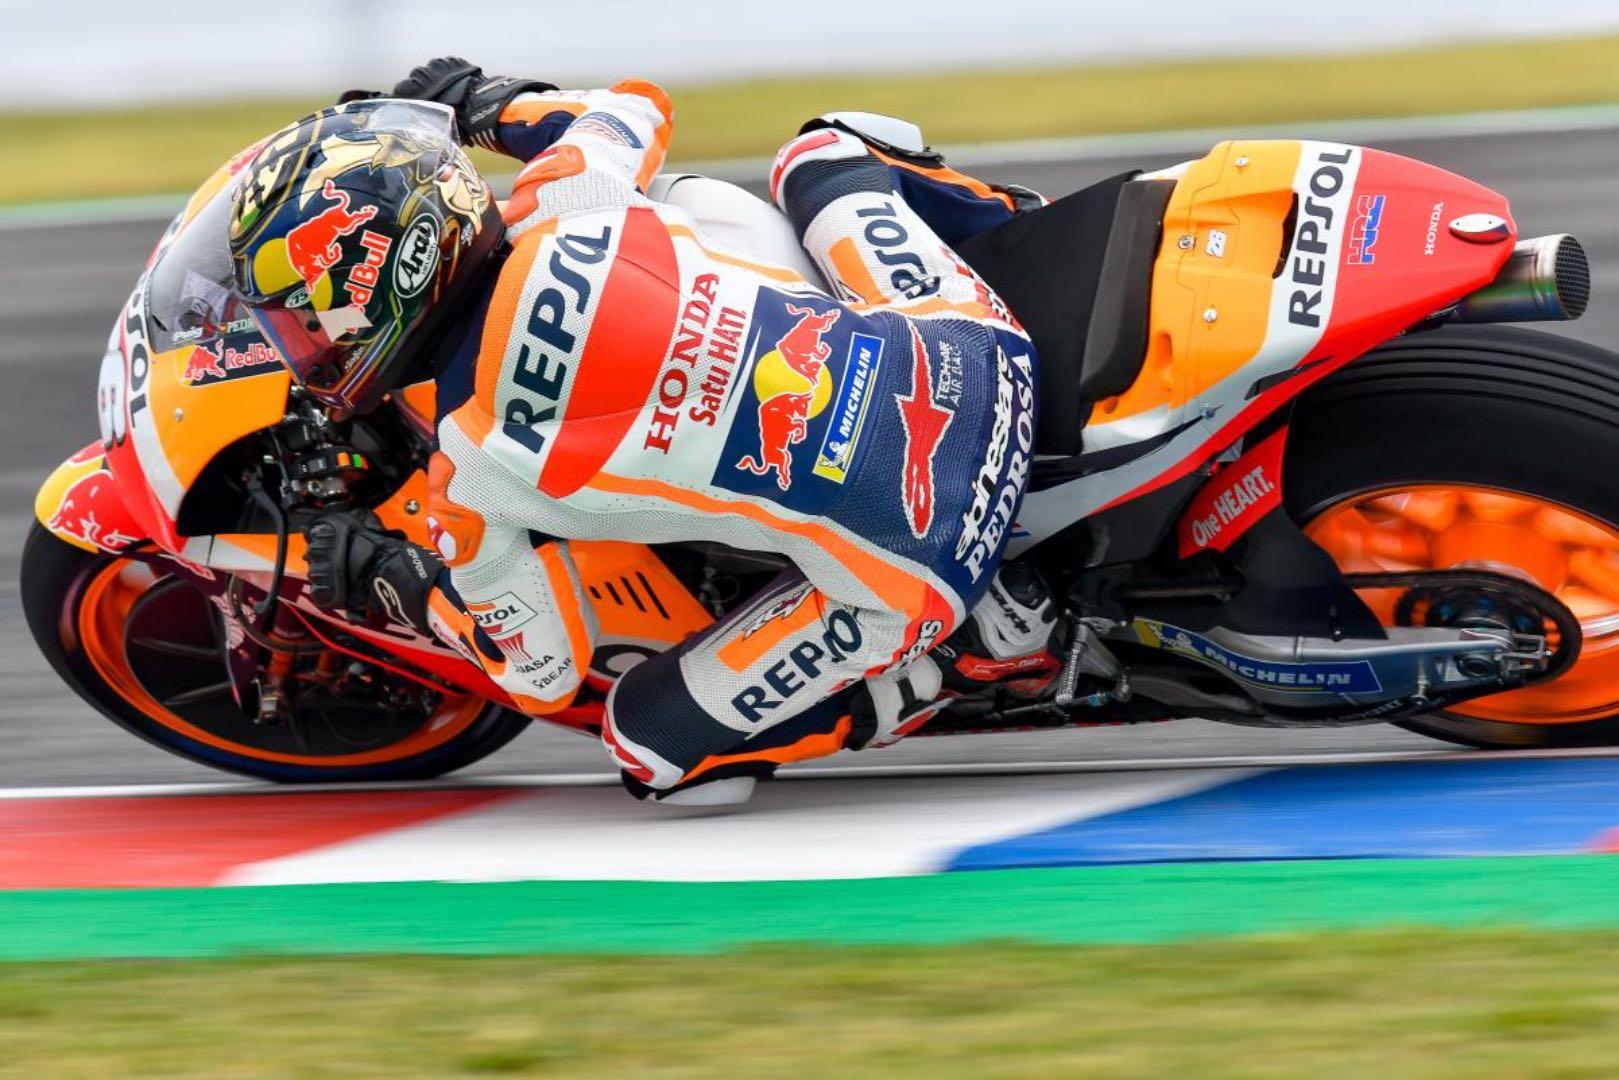 Pedorsa Undergoes Wrist Surgery Following Argentina MotoGP Crash